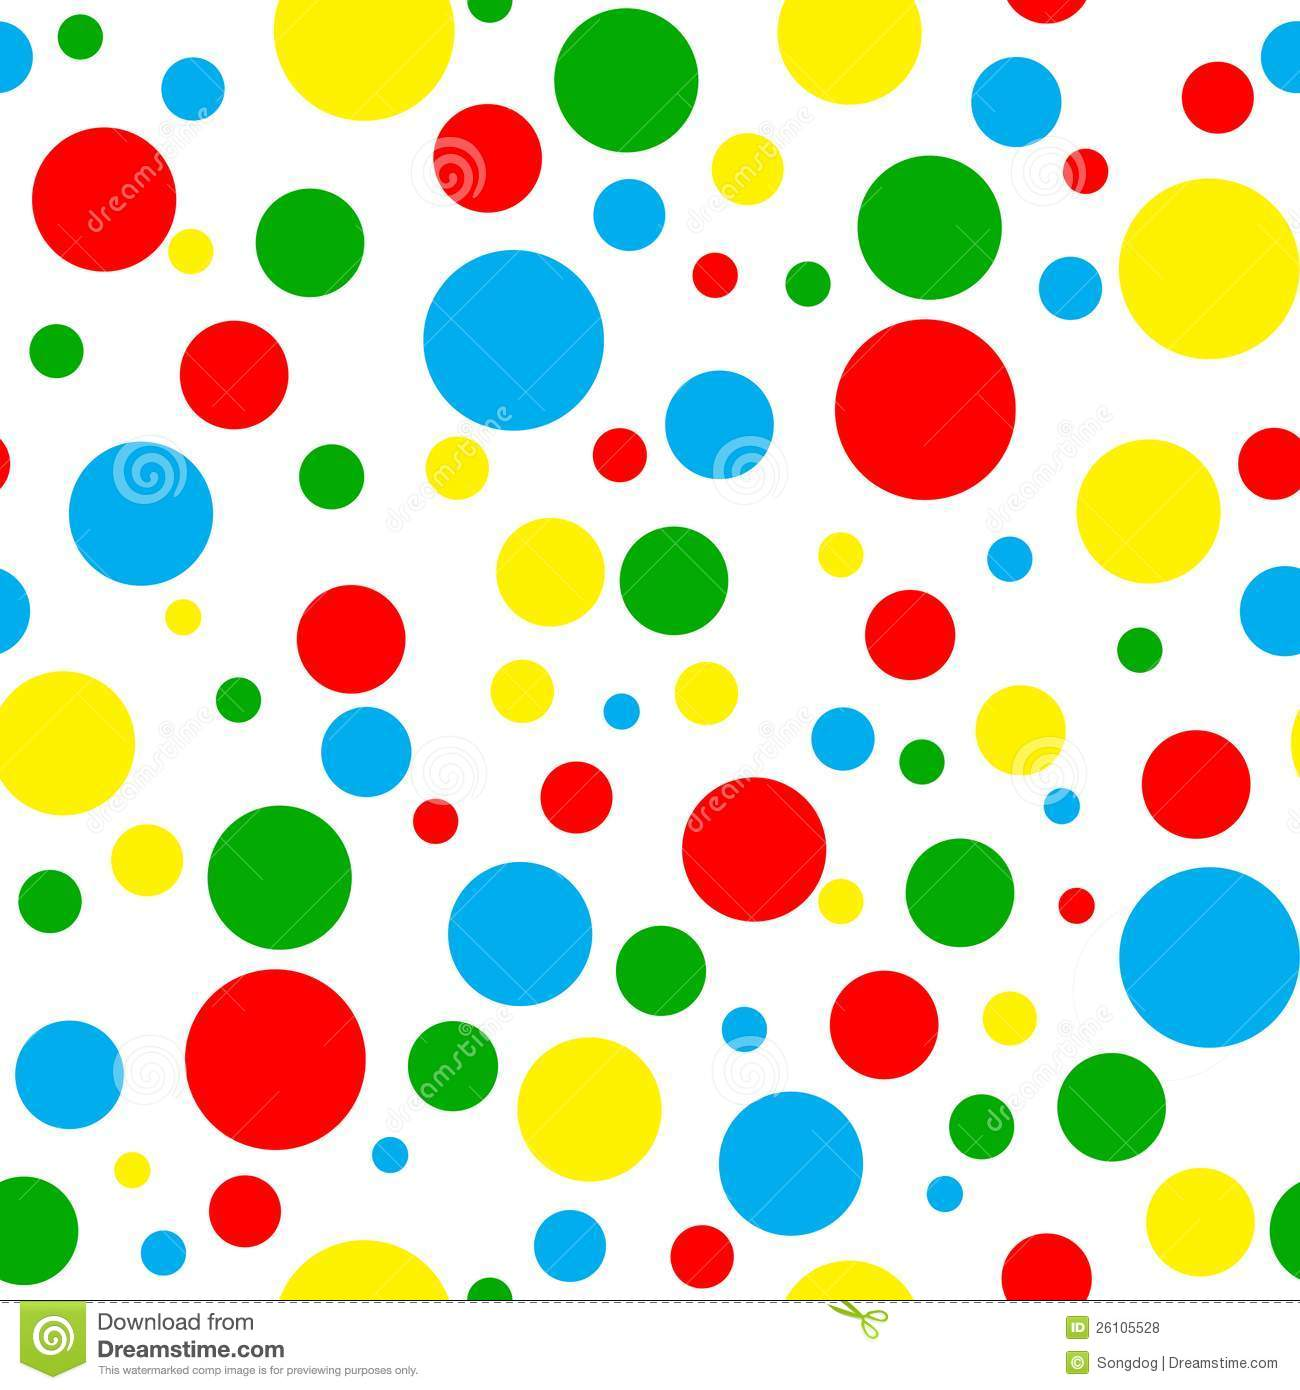 Polka Dot Clipart Free - ClipartFest-Polka dot clipart free - ClipartFest-9